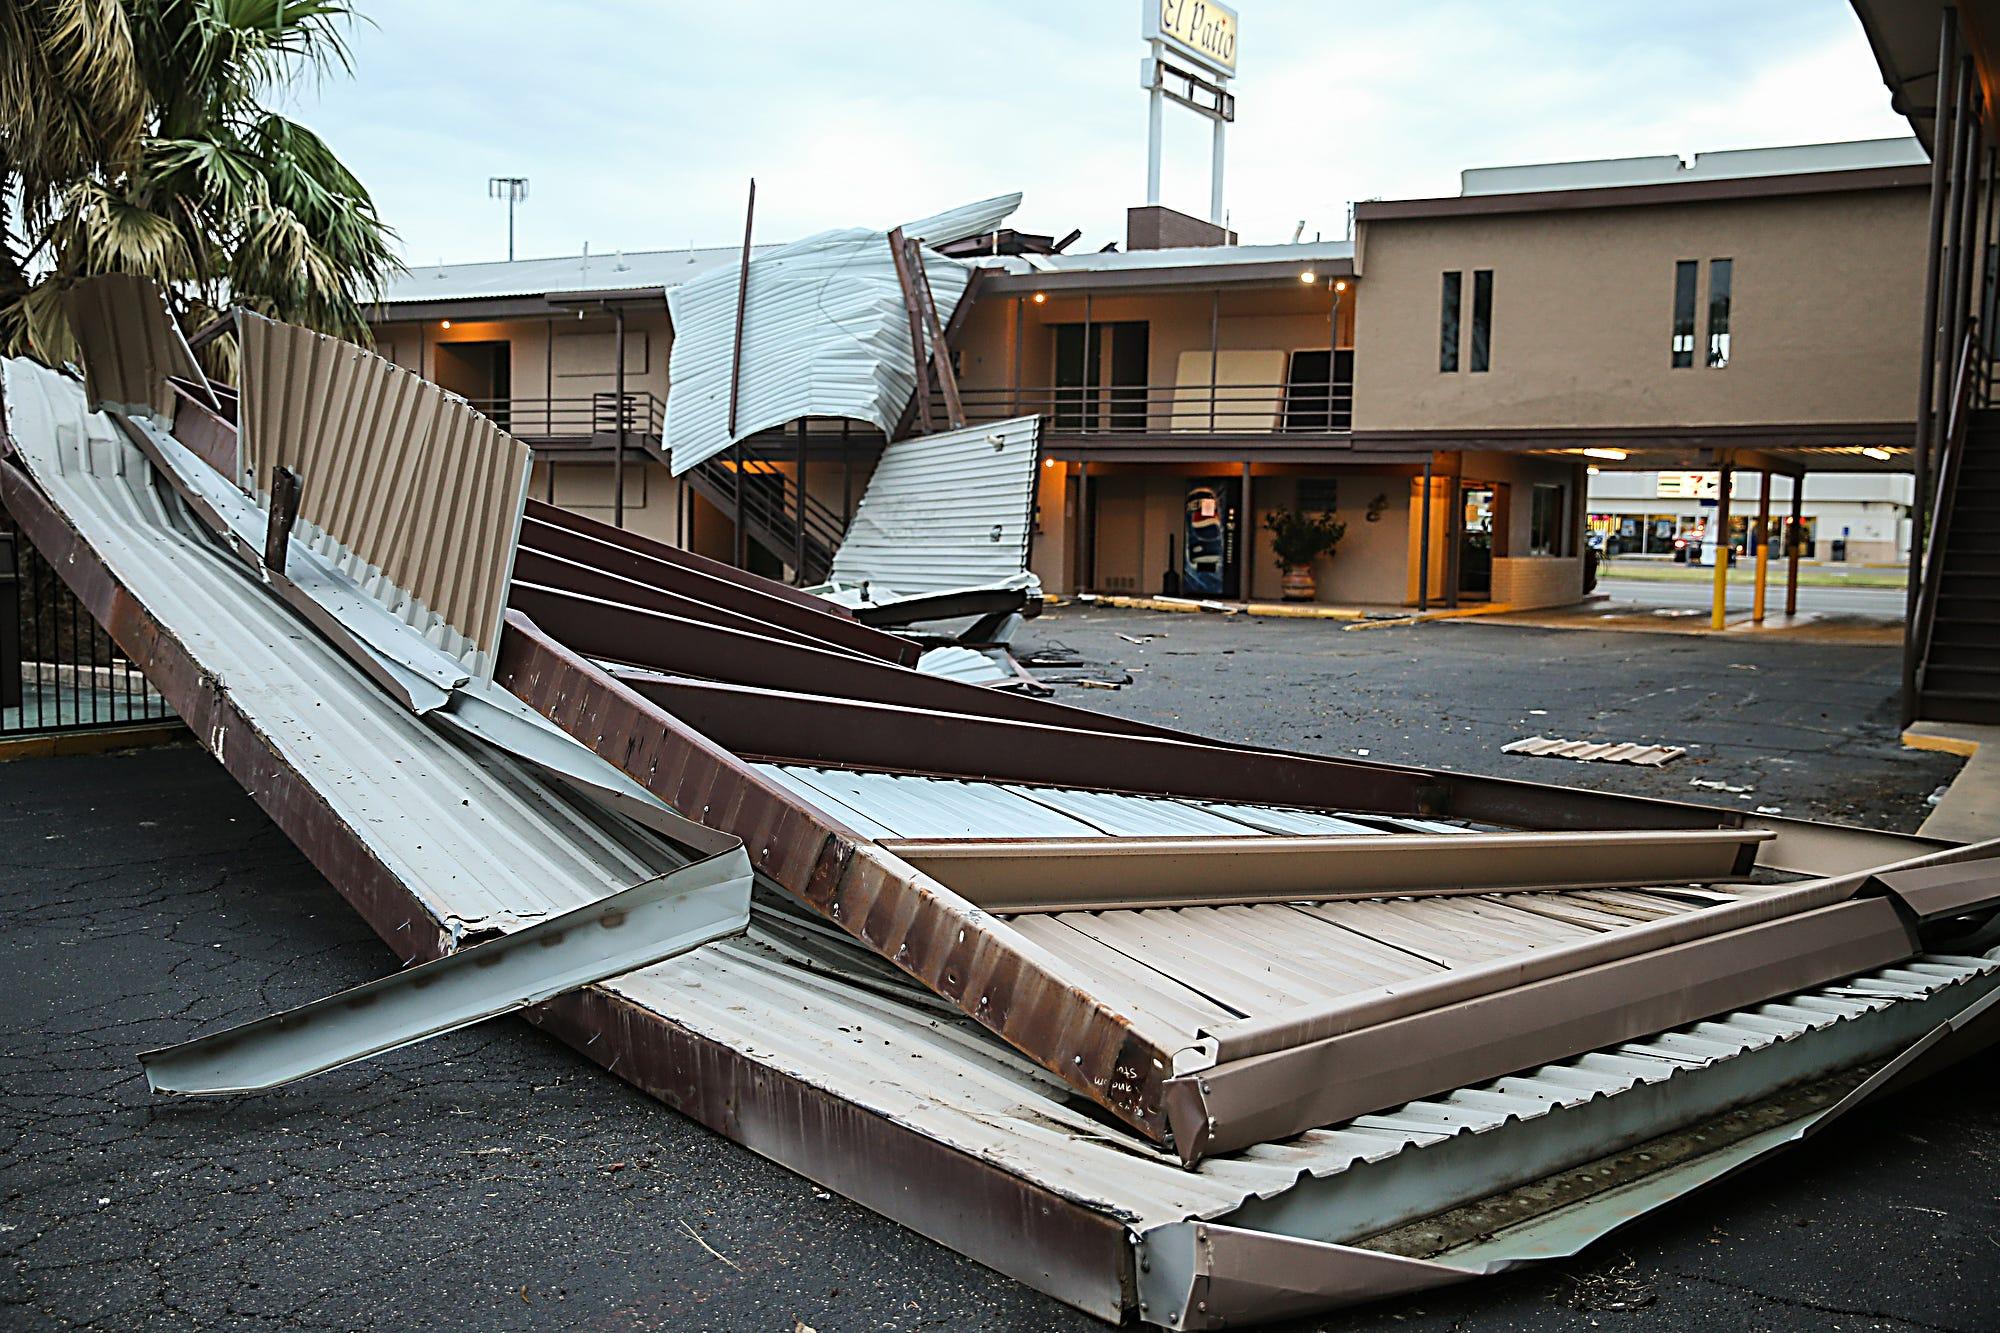 Parts Of The Roof Of El Patio Inn On W. Beauregard